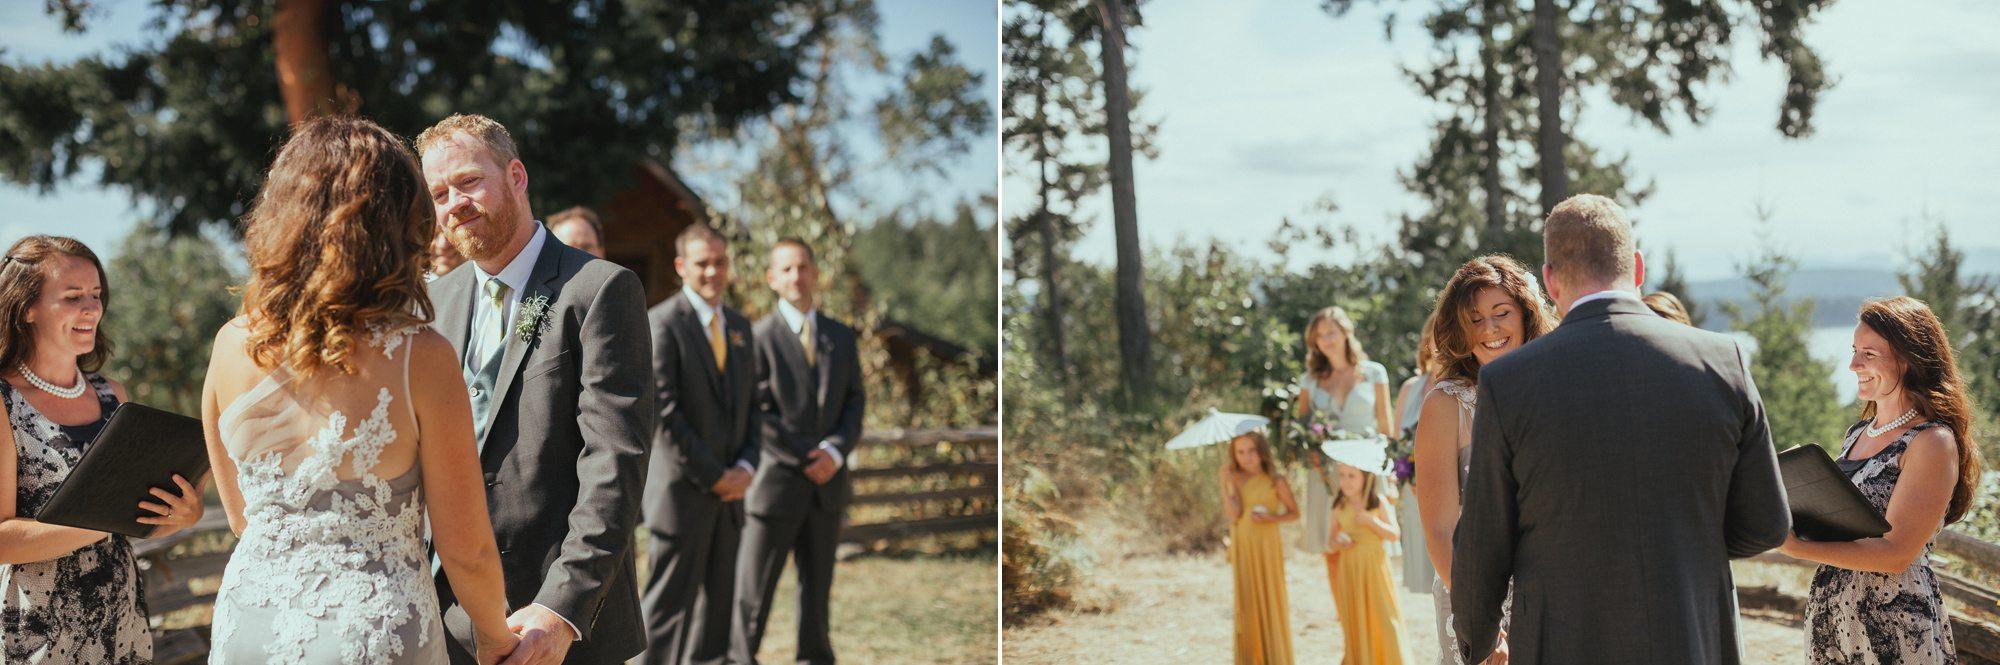 sarah-sal-galiano-wedding-photographer35